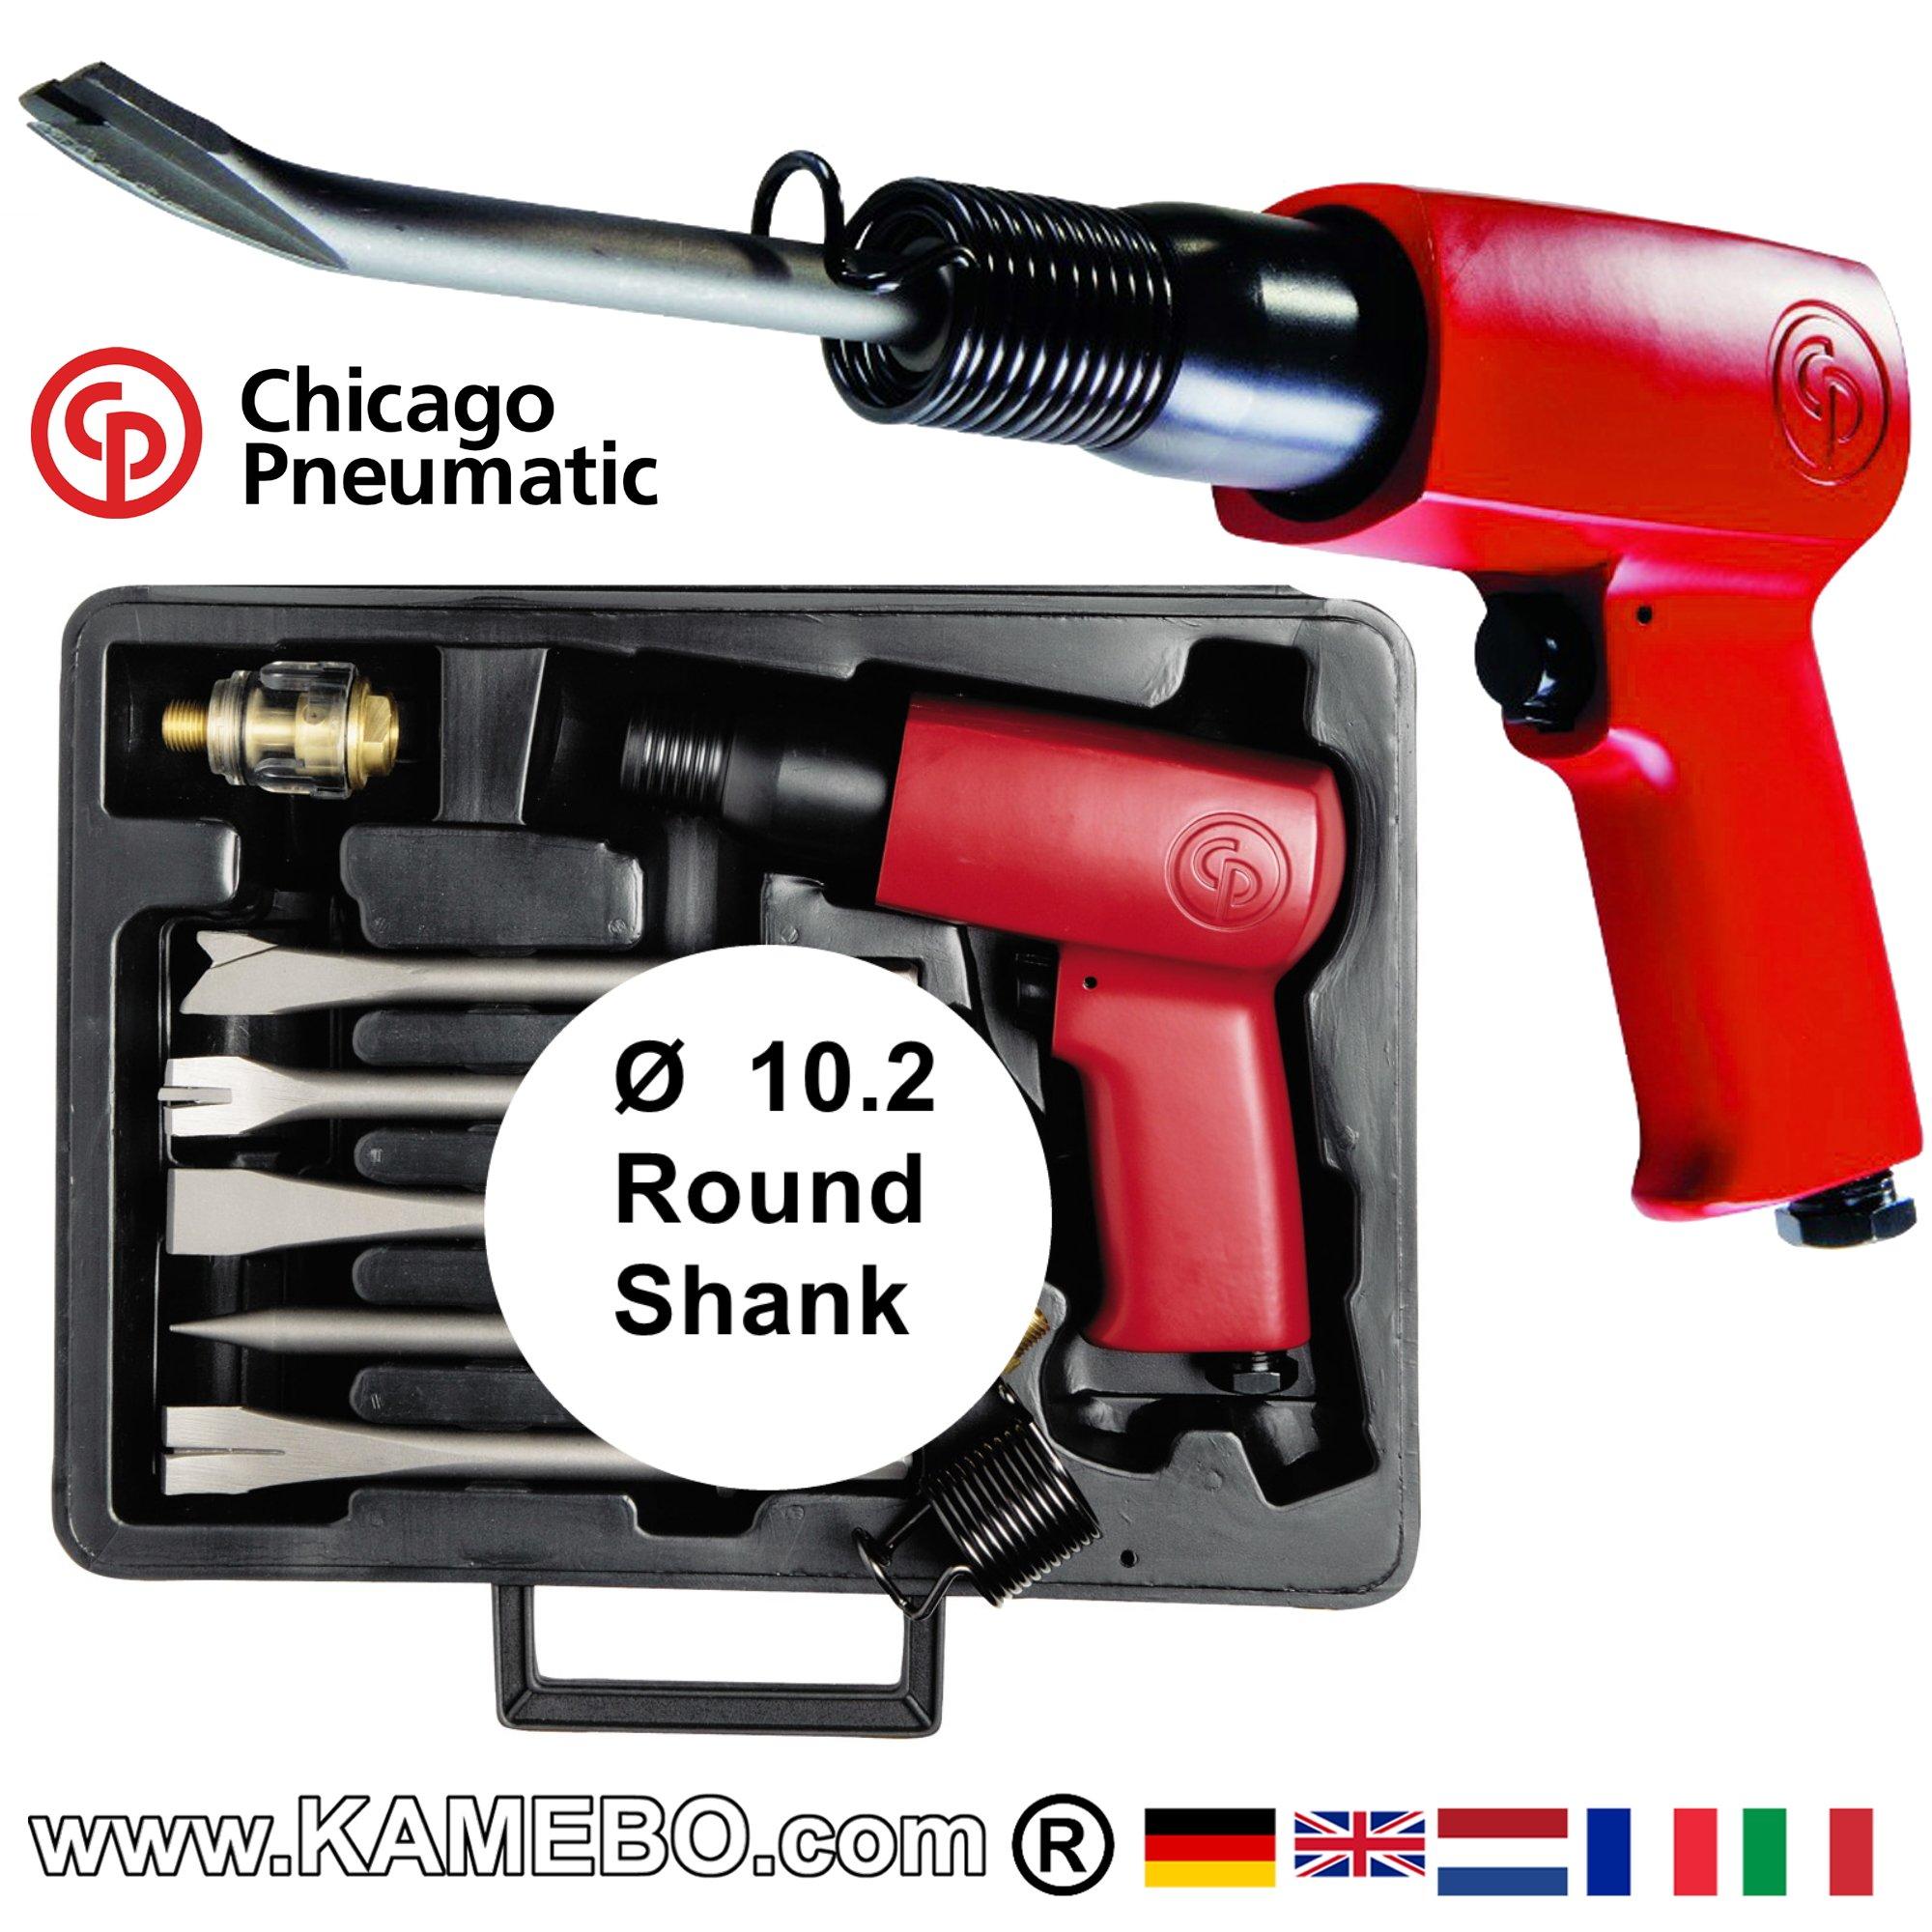 Chicago pneumatic marteau burineur pneumatique cp7111k kit kamebo - Marteau burineur pneumatique ...